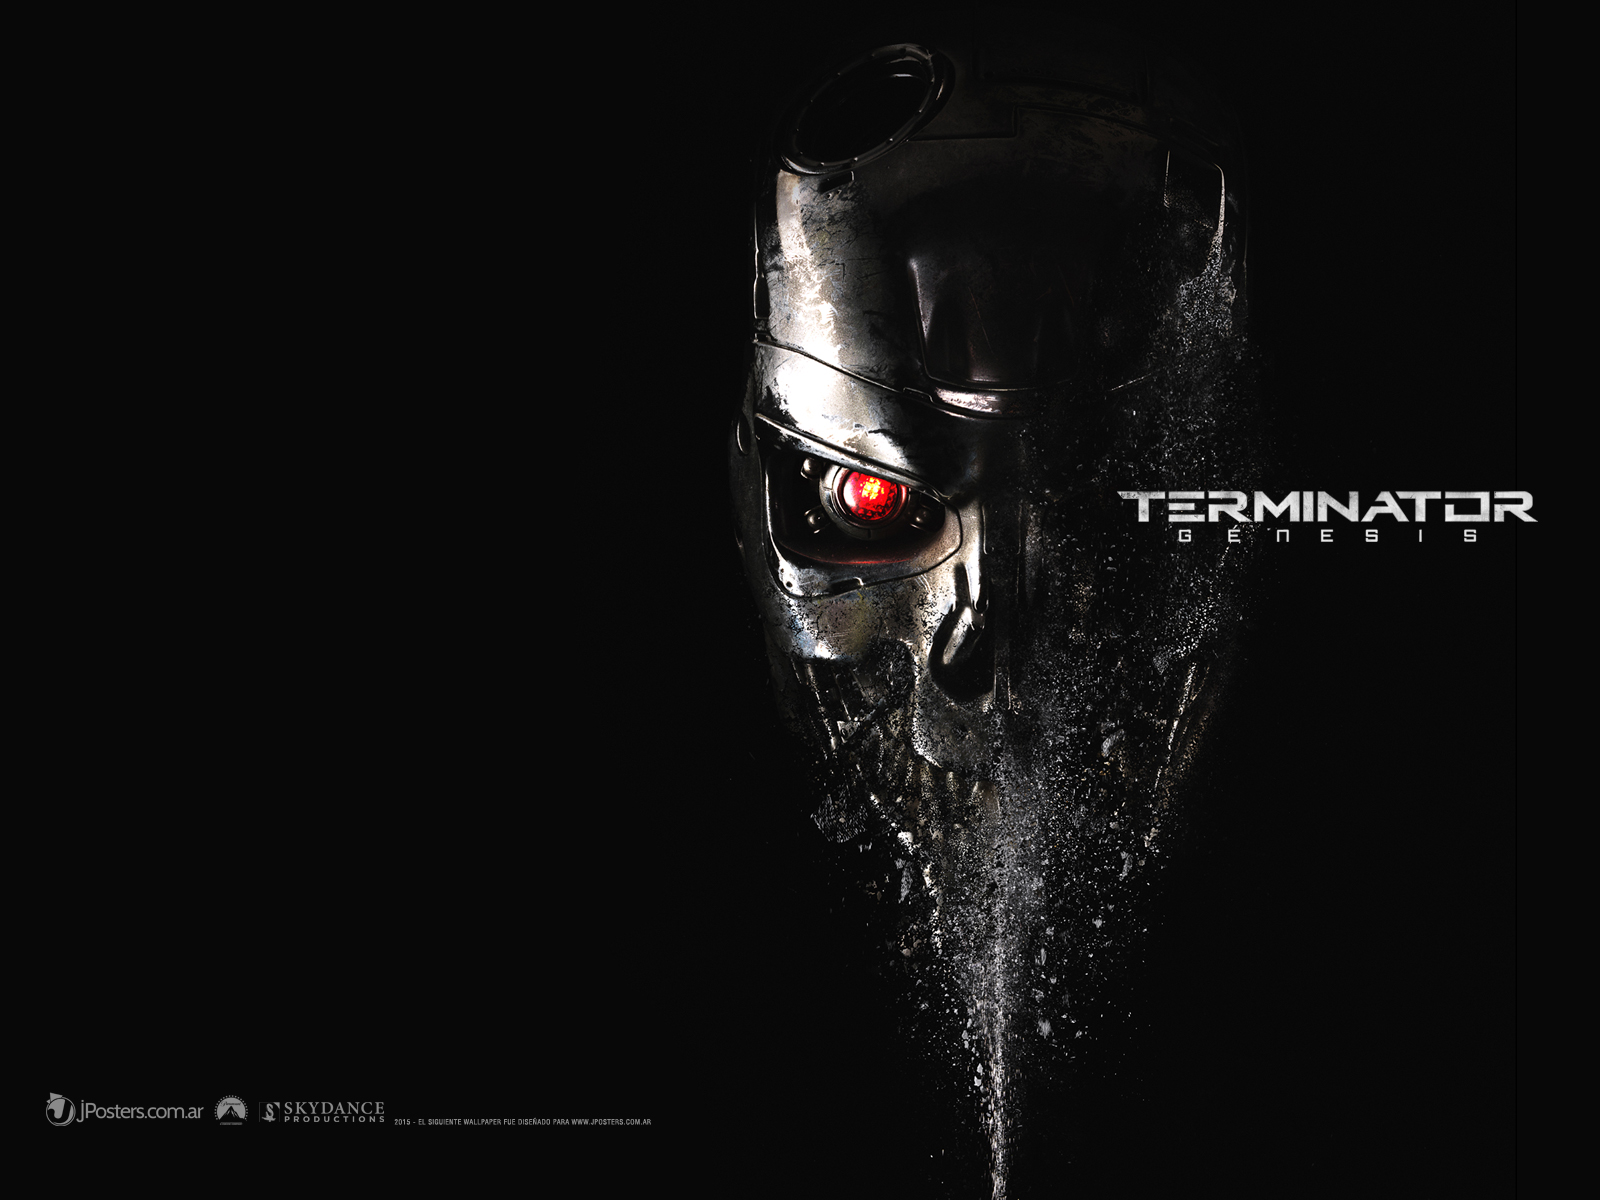 Download wallpaper  Terminator T  Free  K Wallpaper